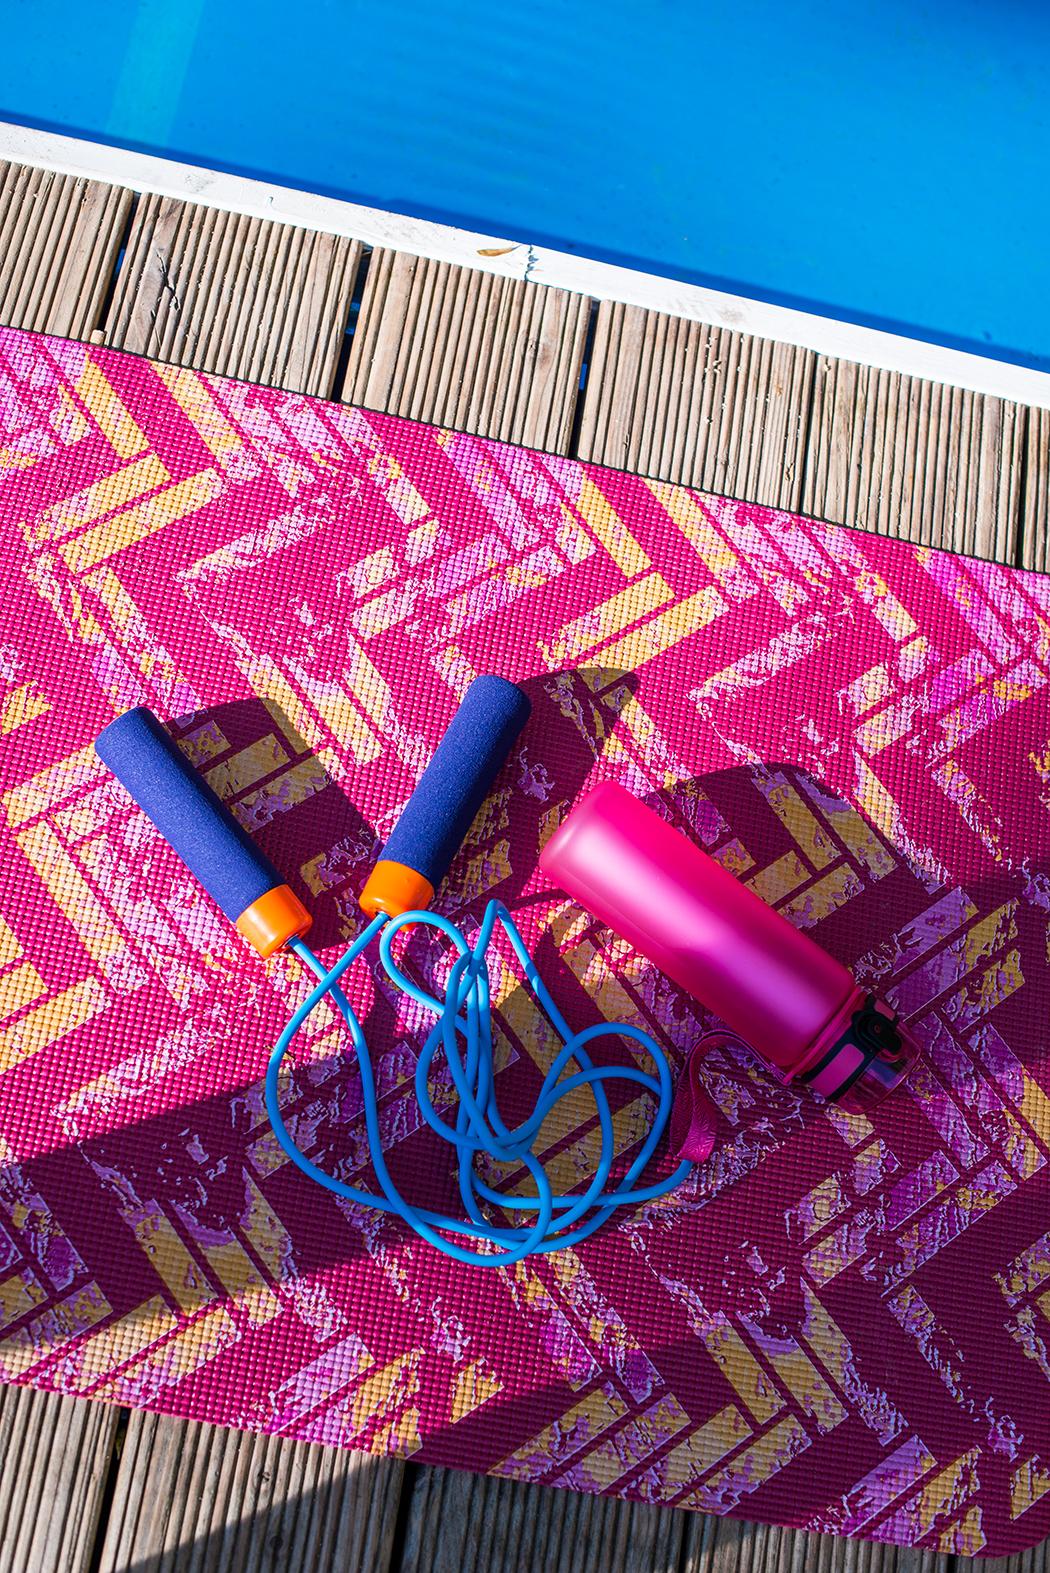 Fitnessblog-Fitnessblogger-Fitness-Blog-Blogger-Sport-Tchibo-Yoga-Wochenwelt-Lindarella-Linda-8